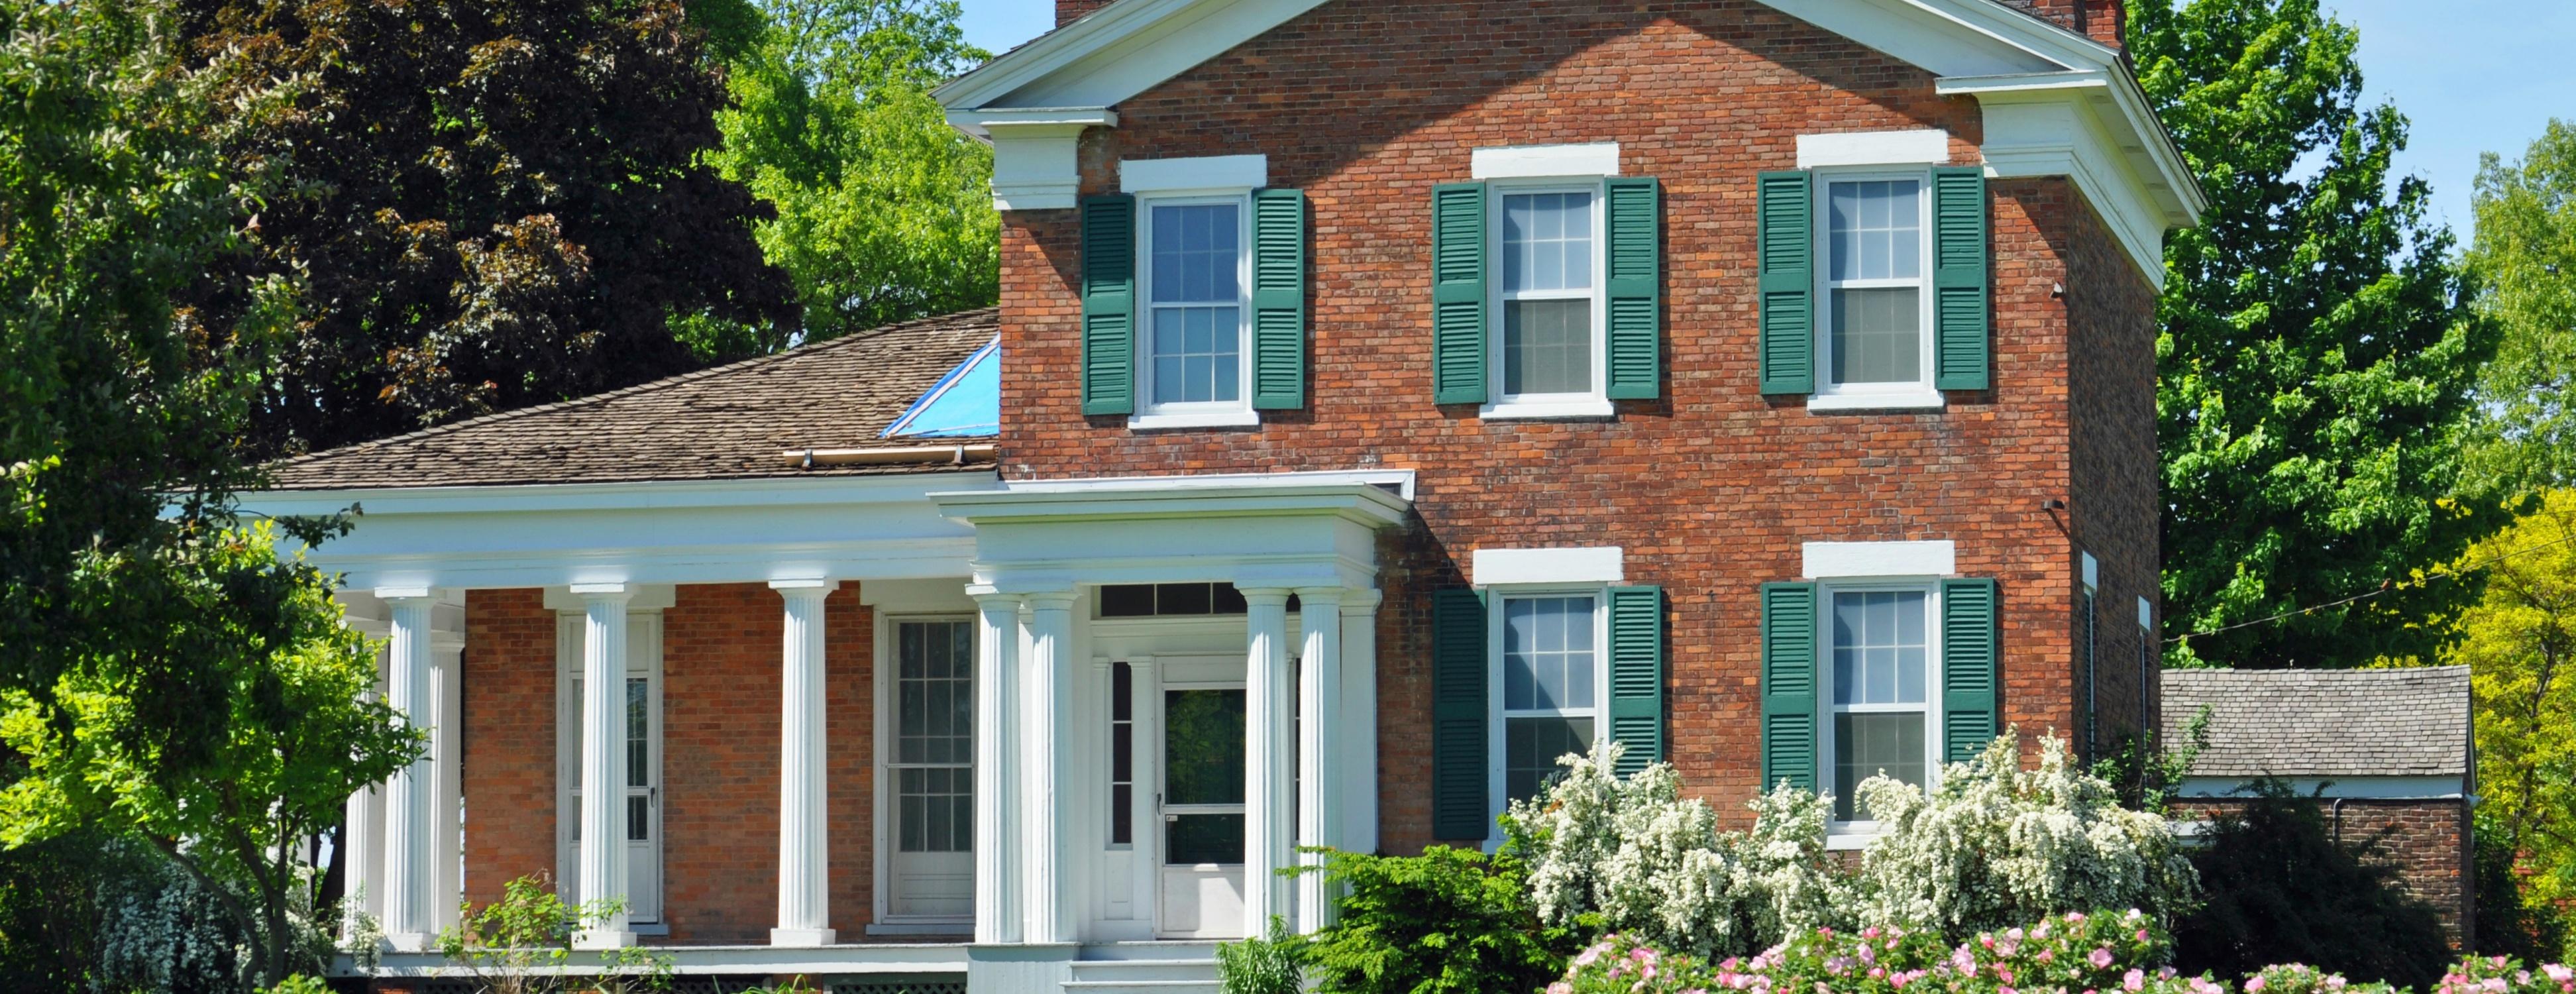 homeownersinsaggnorwellma